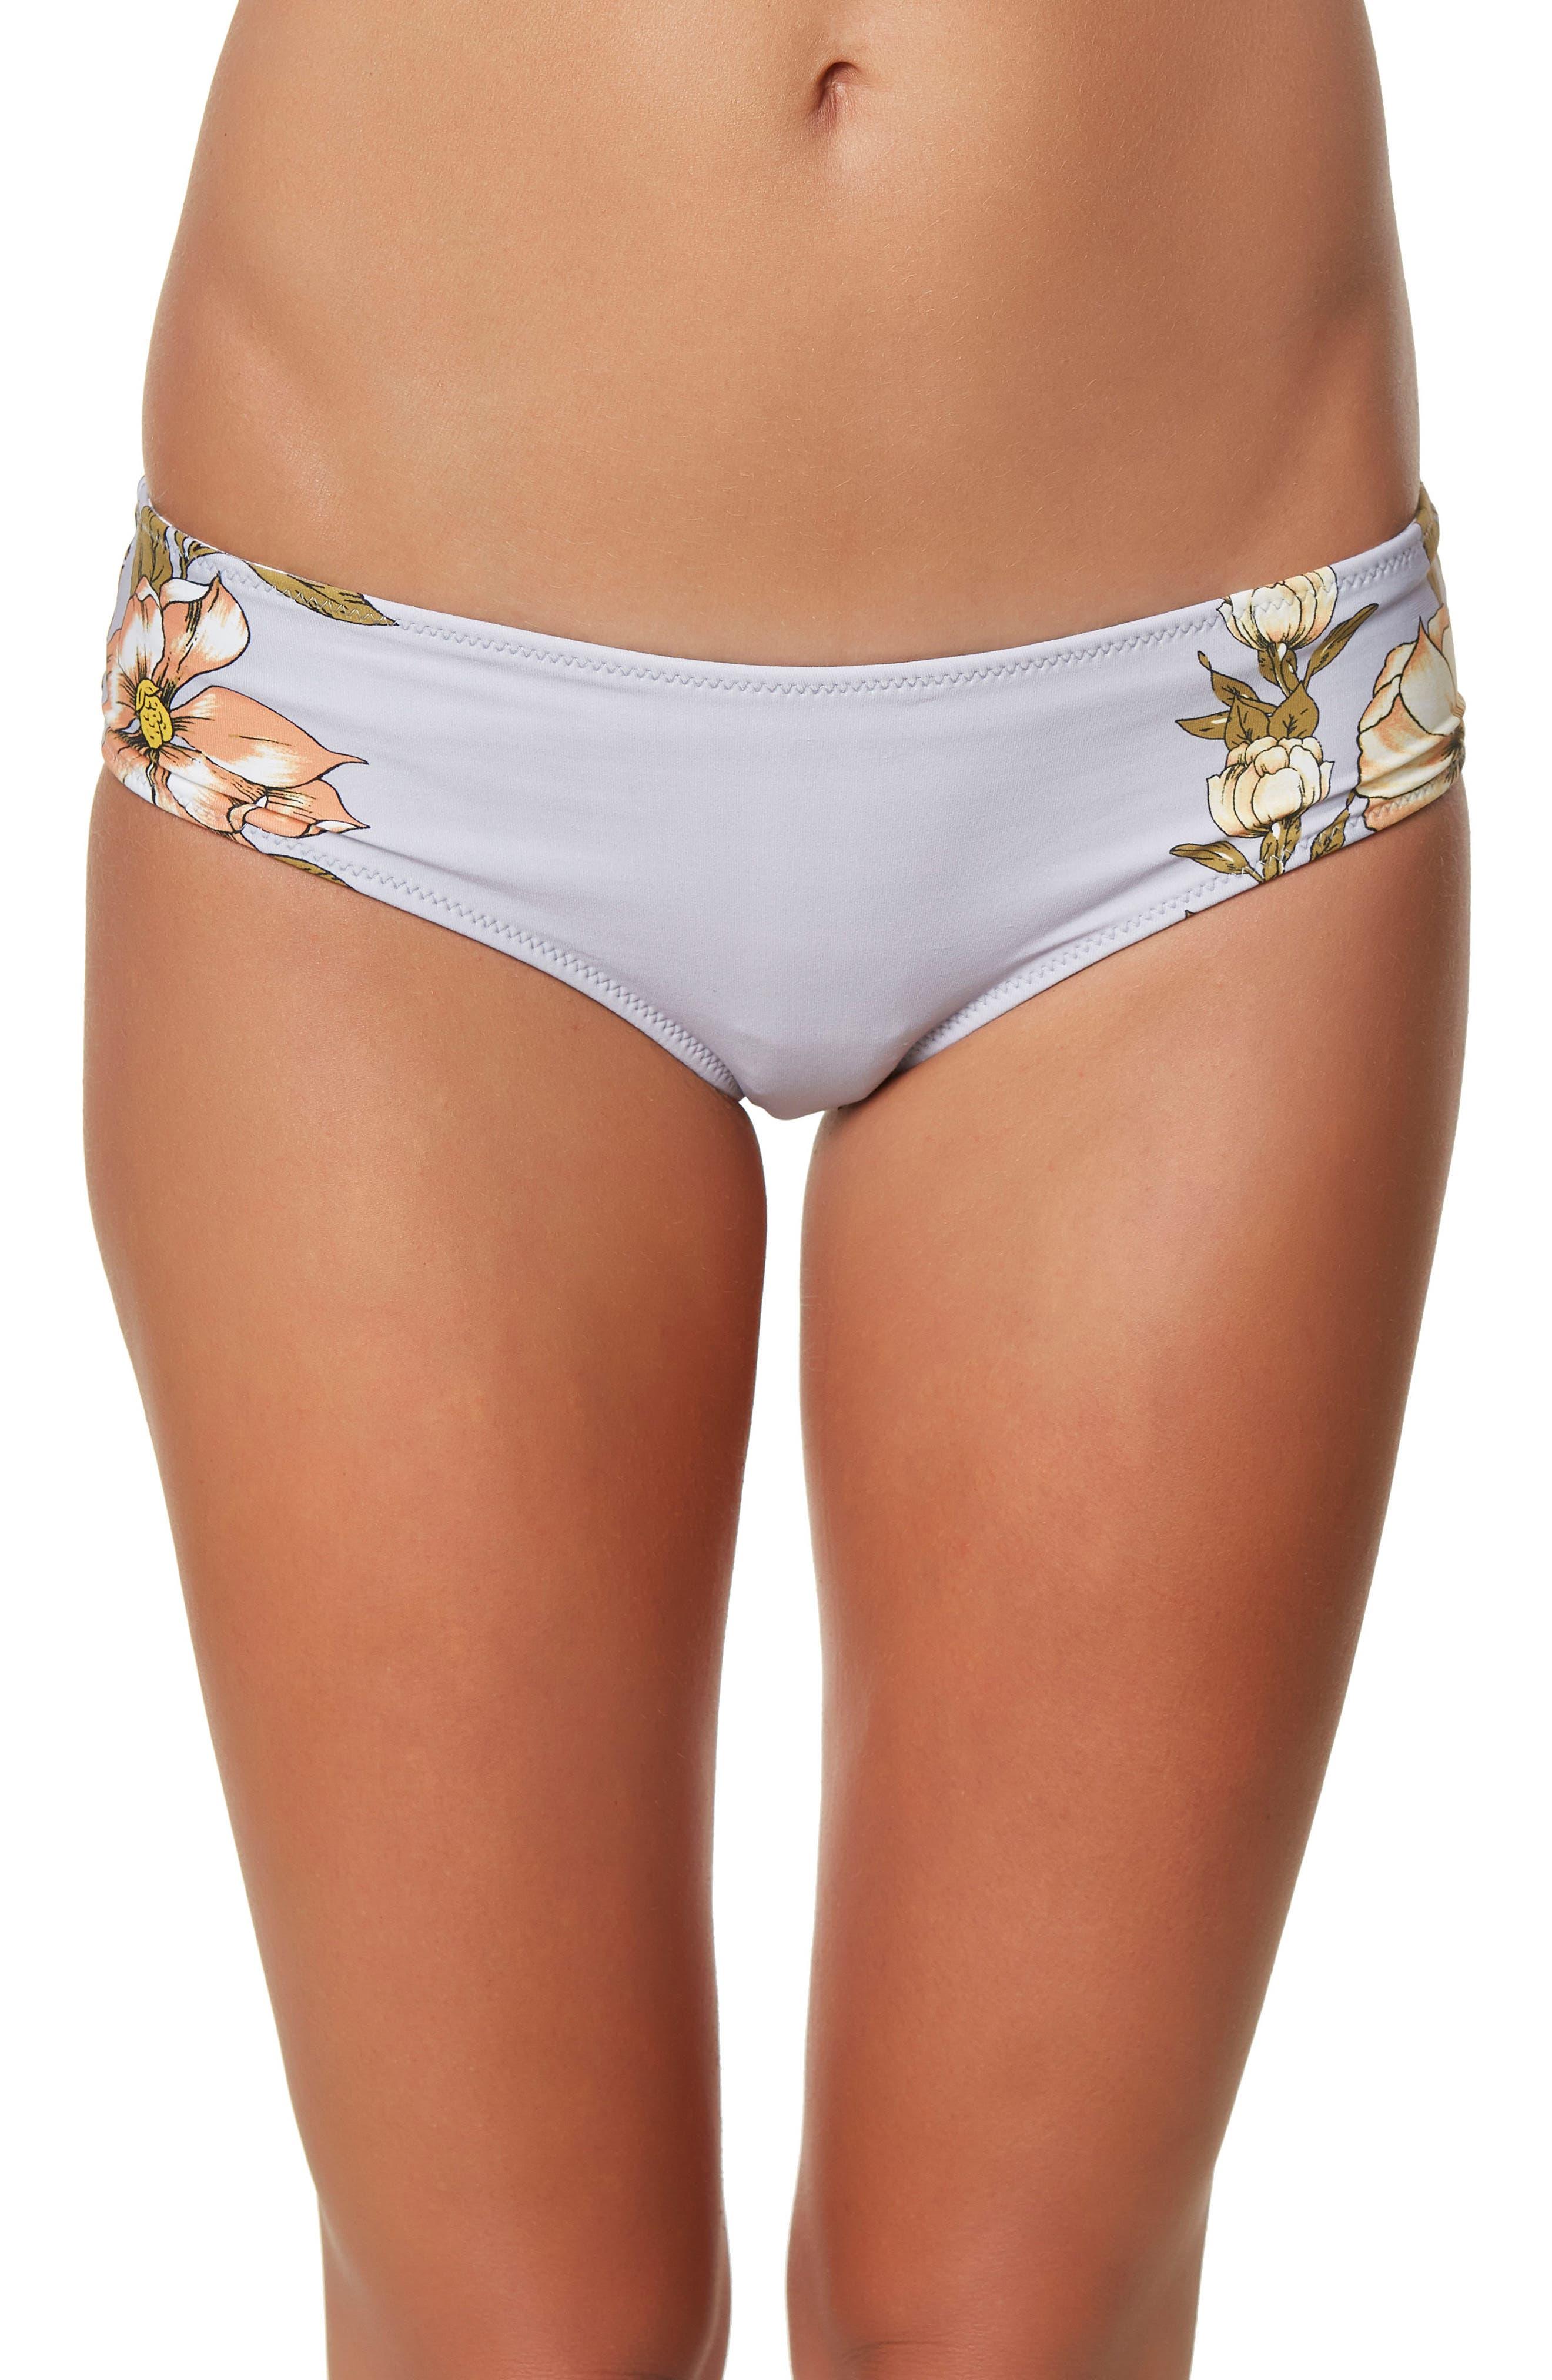 O'Neill Aloha Floral Revo Hipster Bikini Bottoms